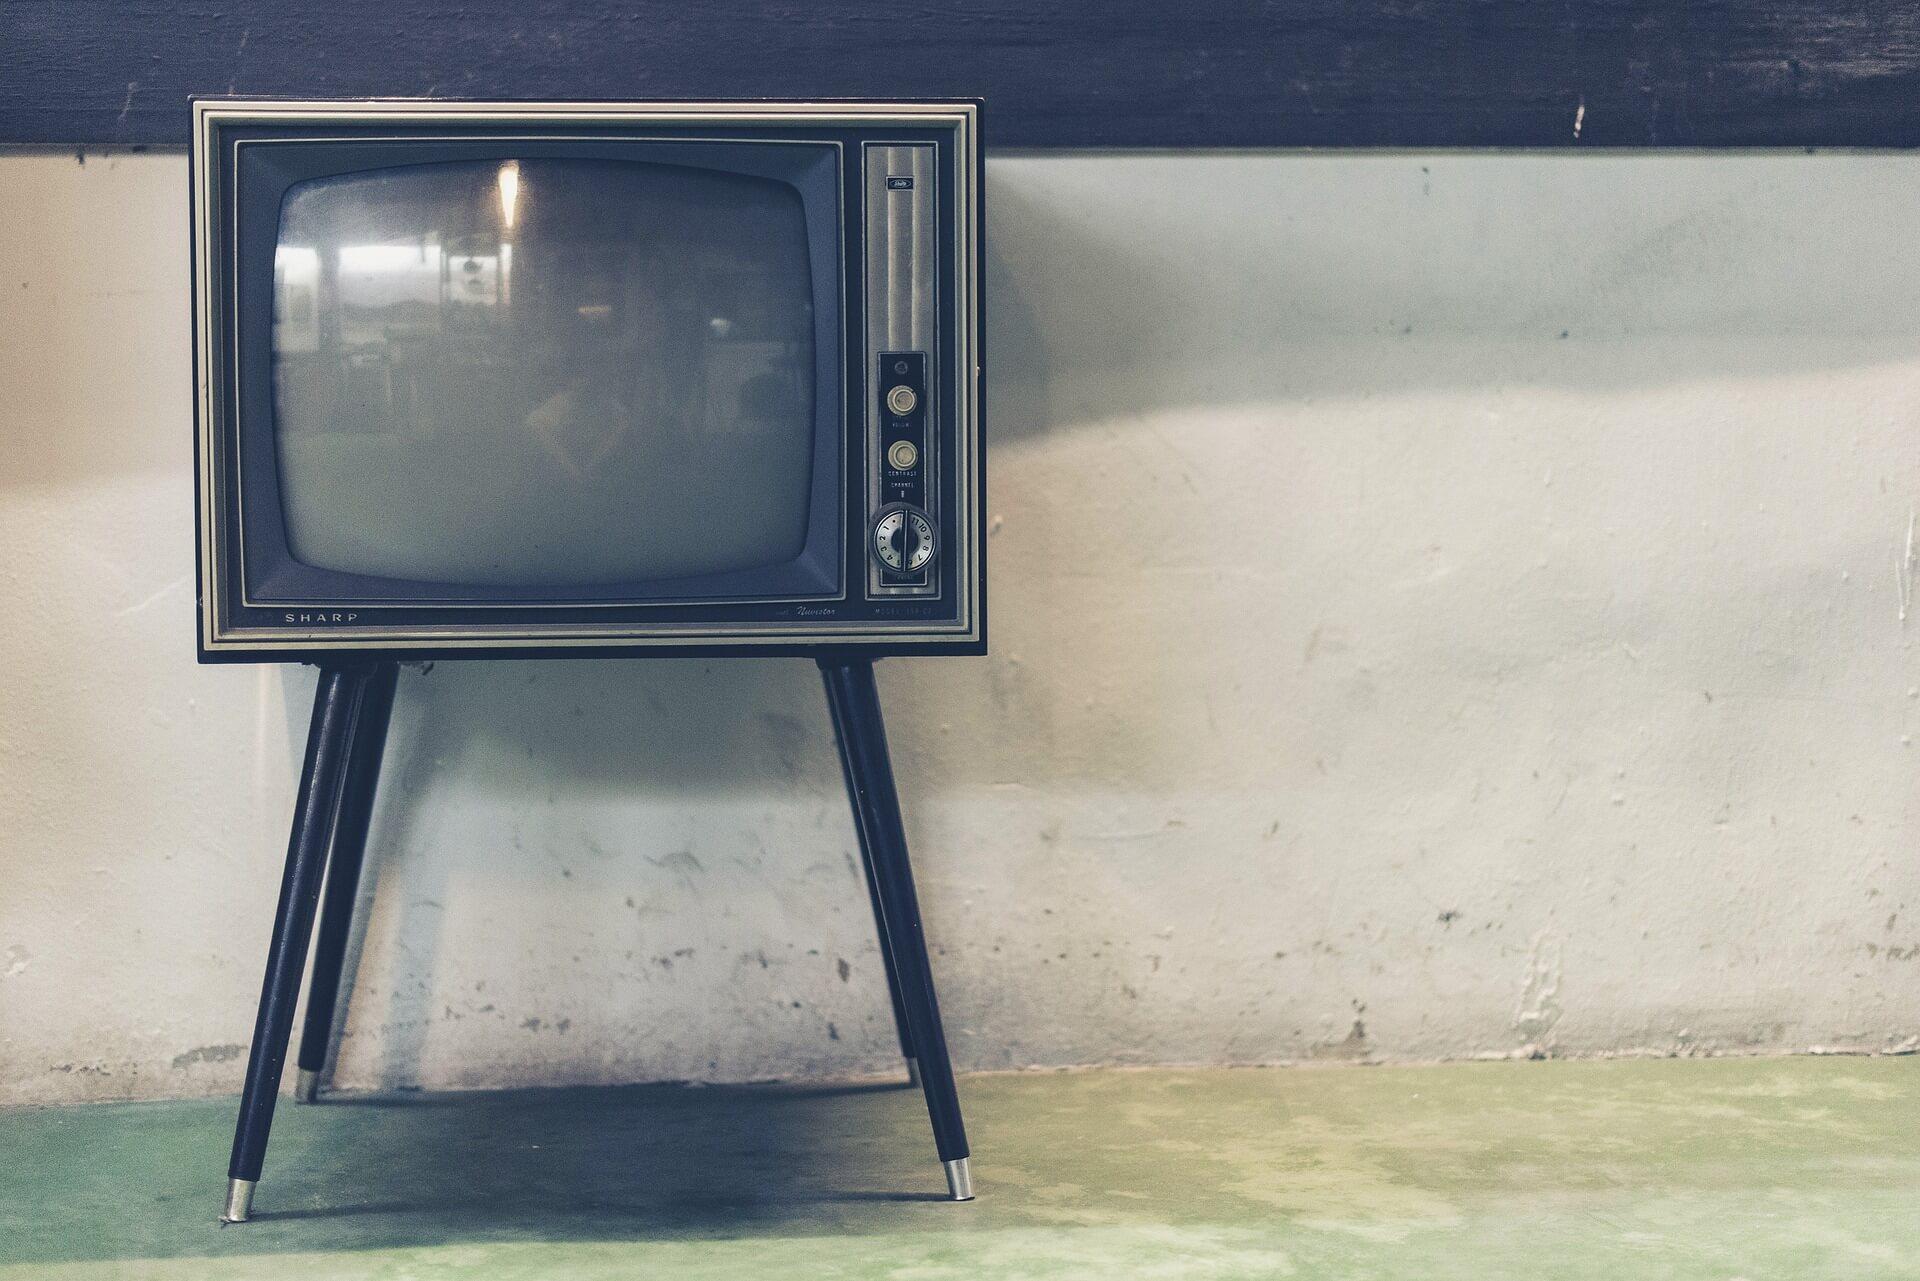 TV Man, America's Strangest Superhero